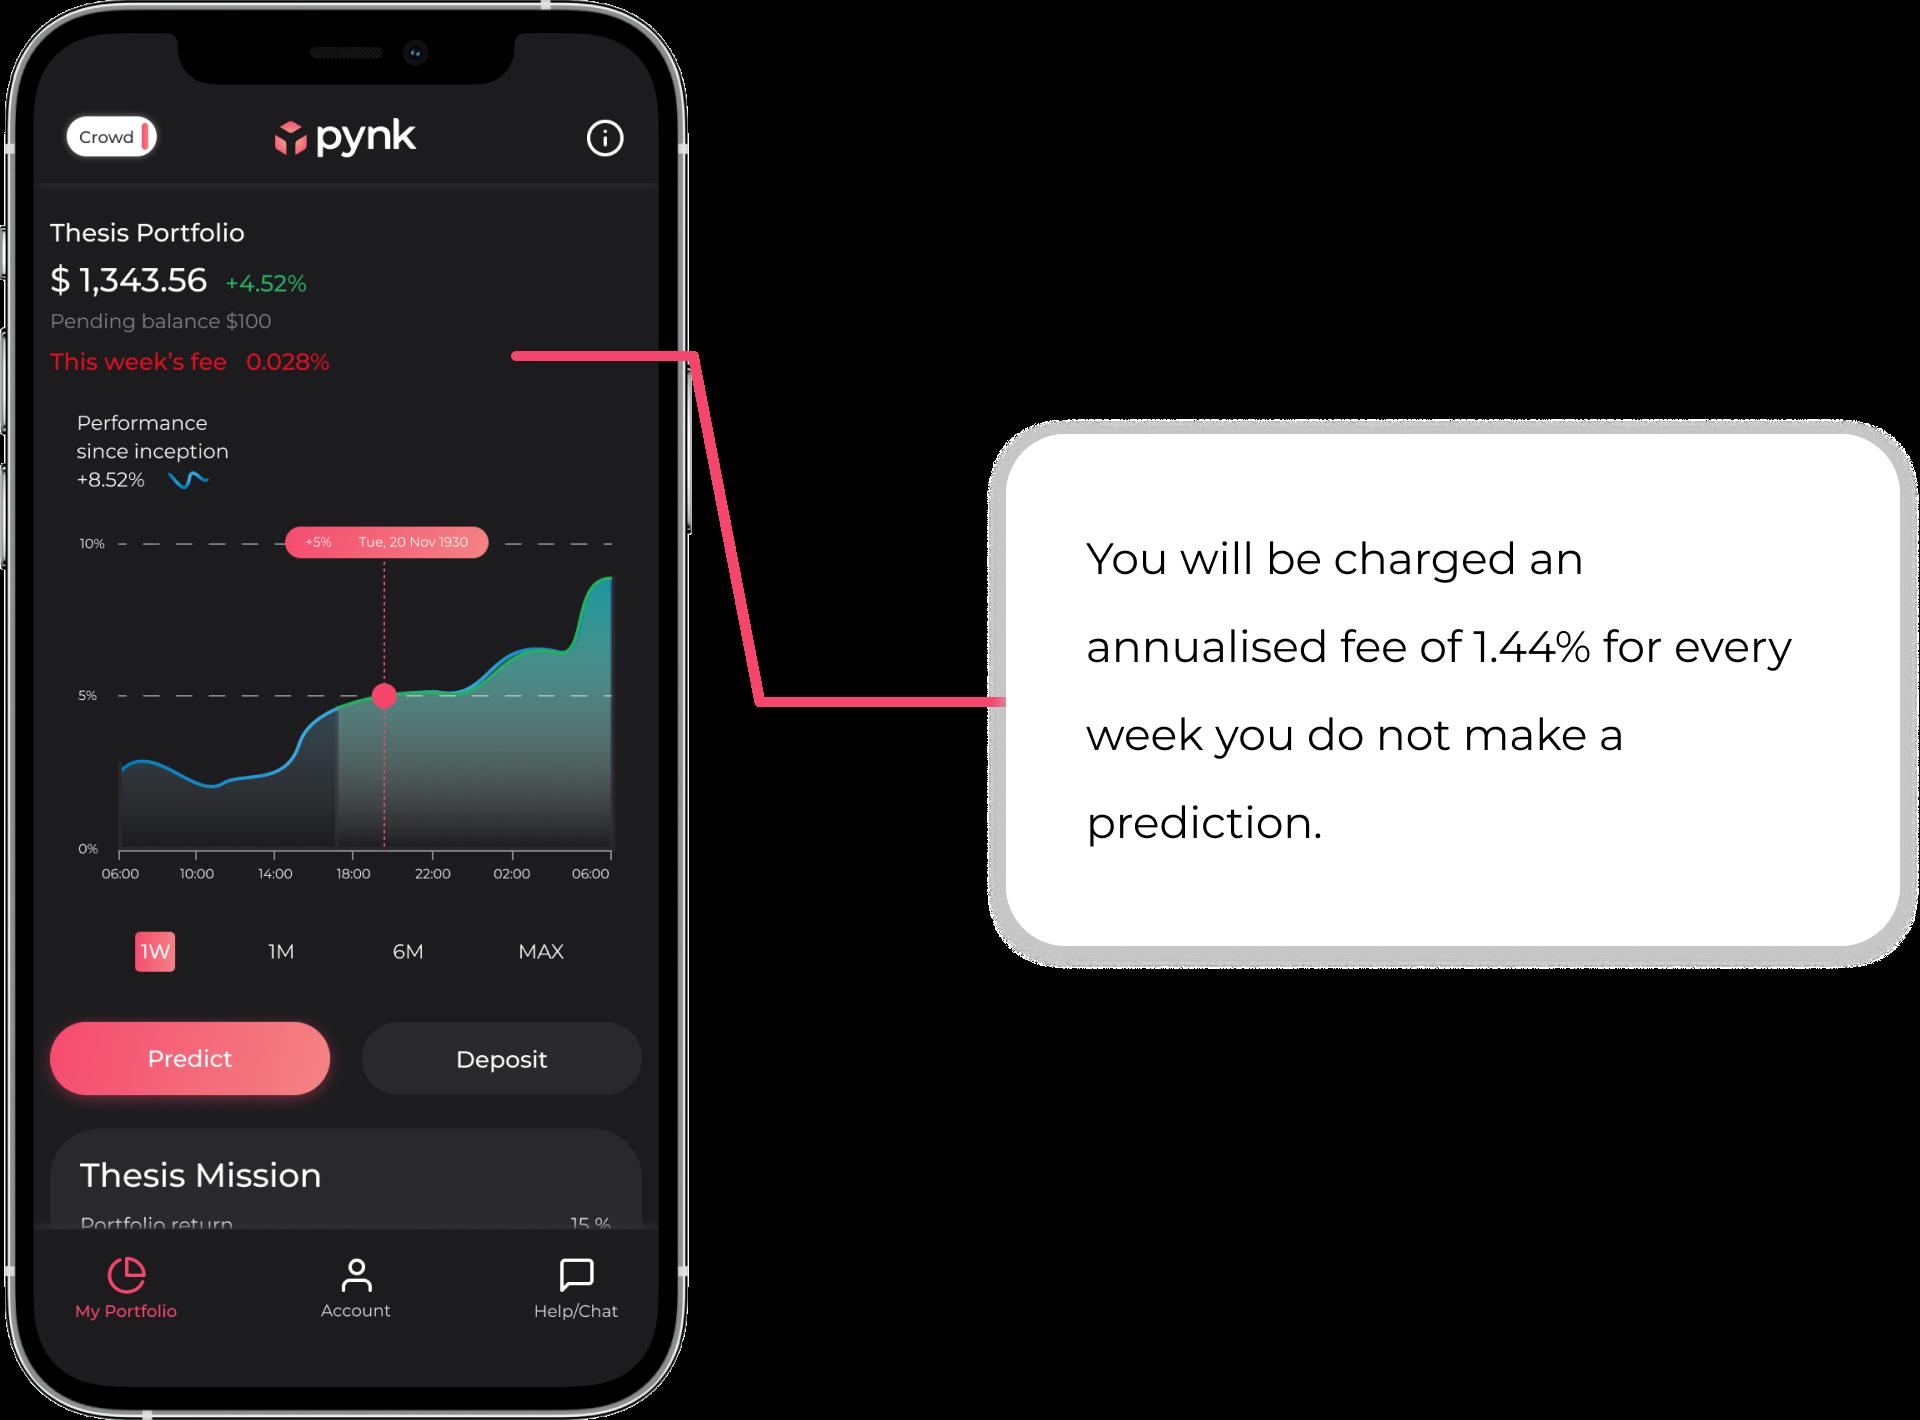 Pynk zero fees investing criteria description